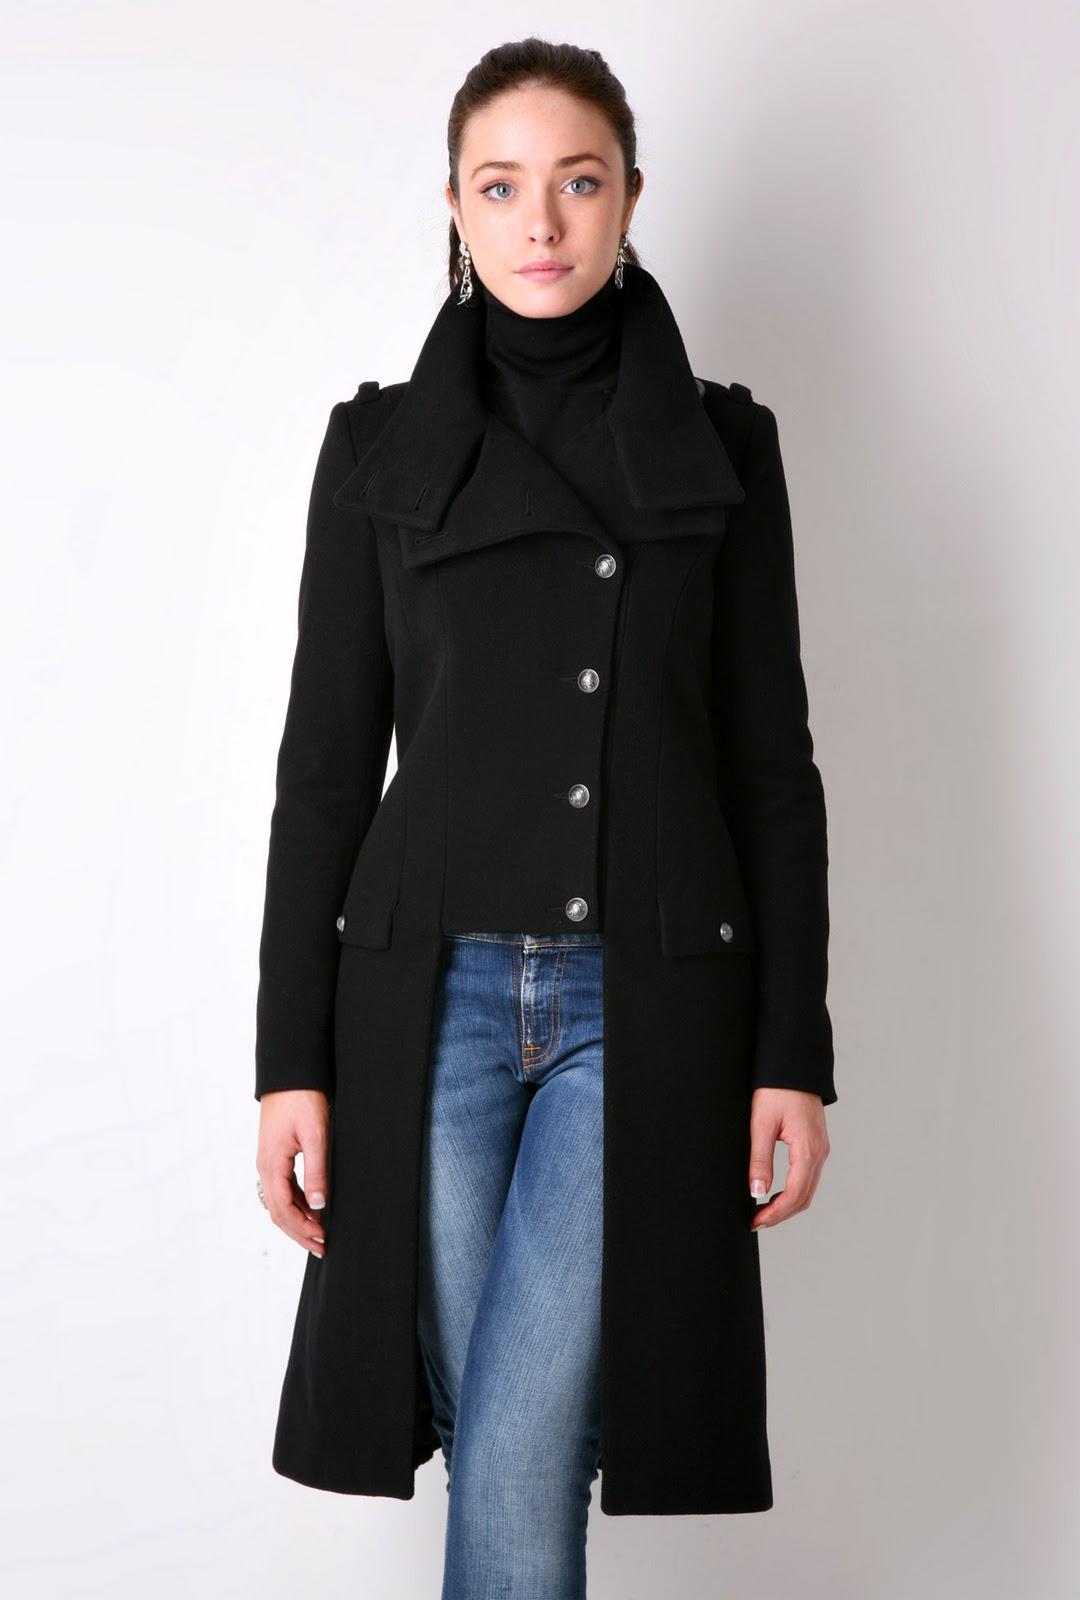 Formal coats for women